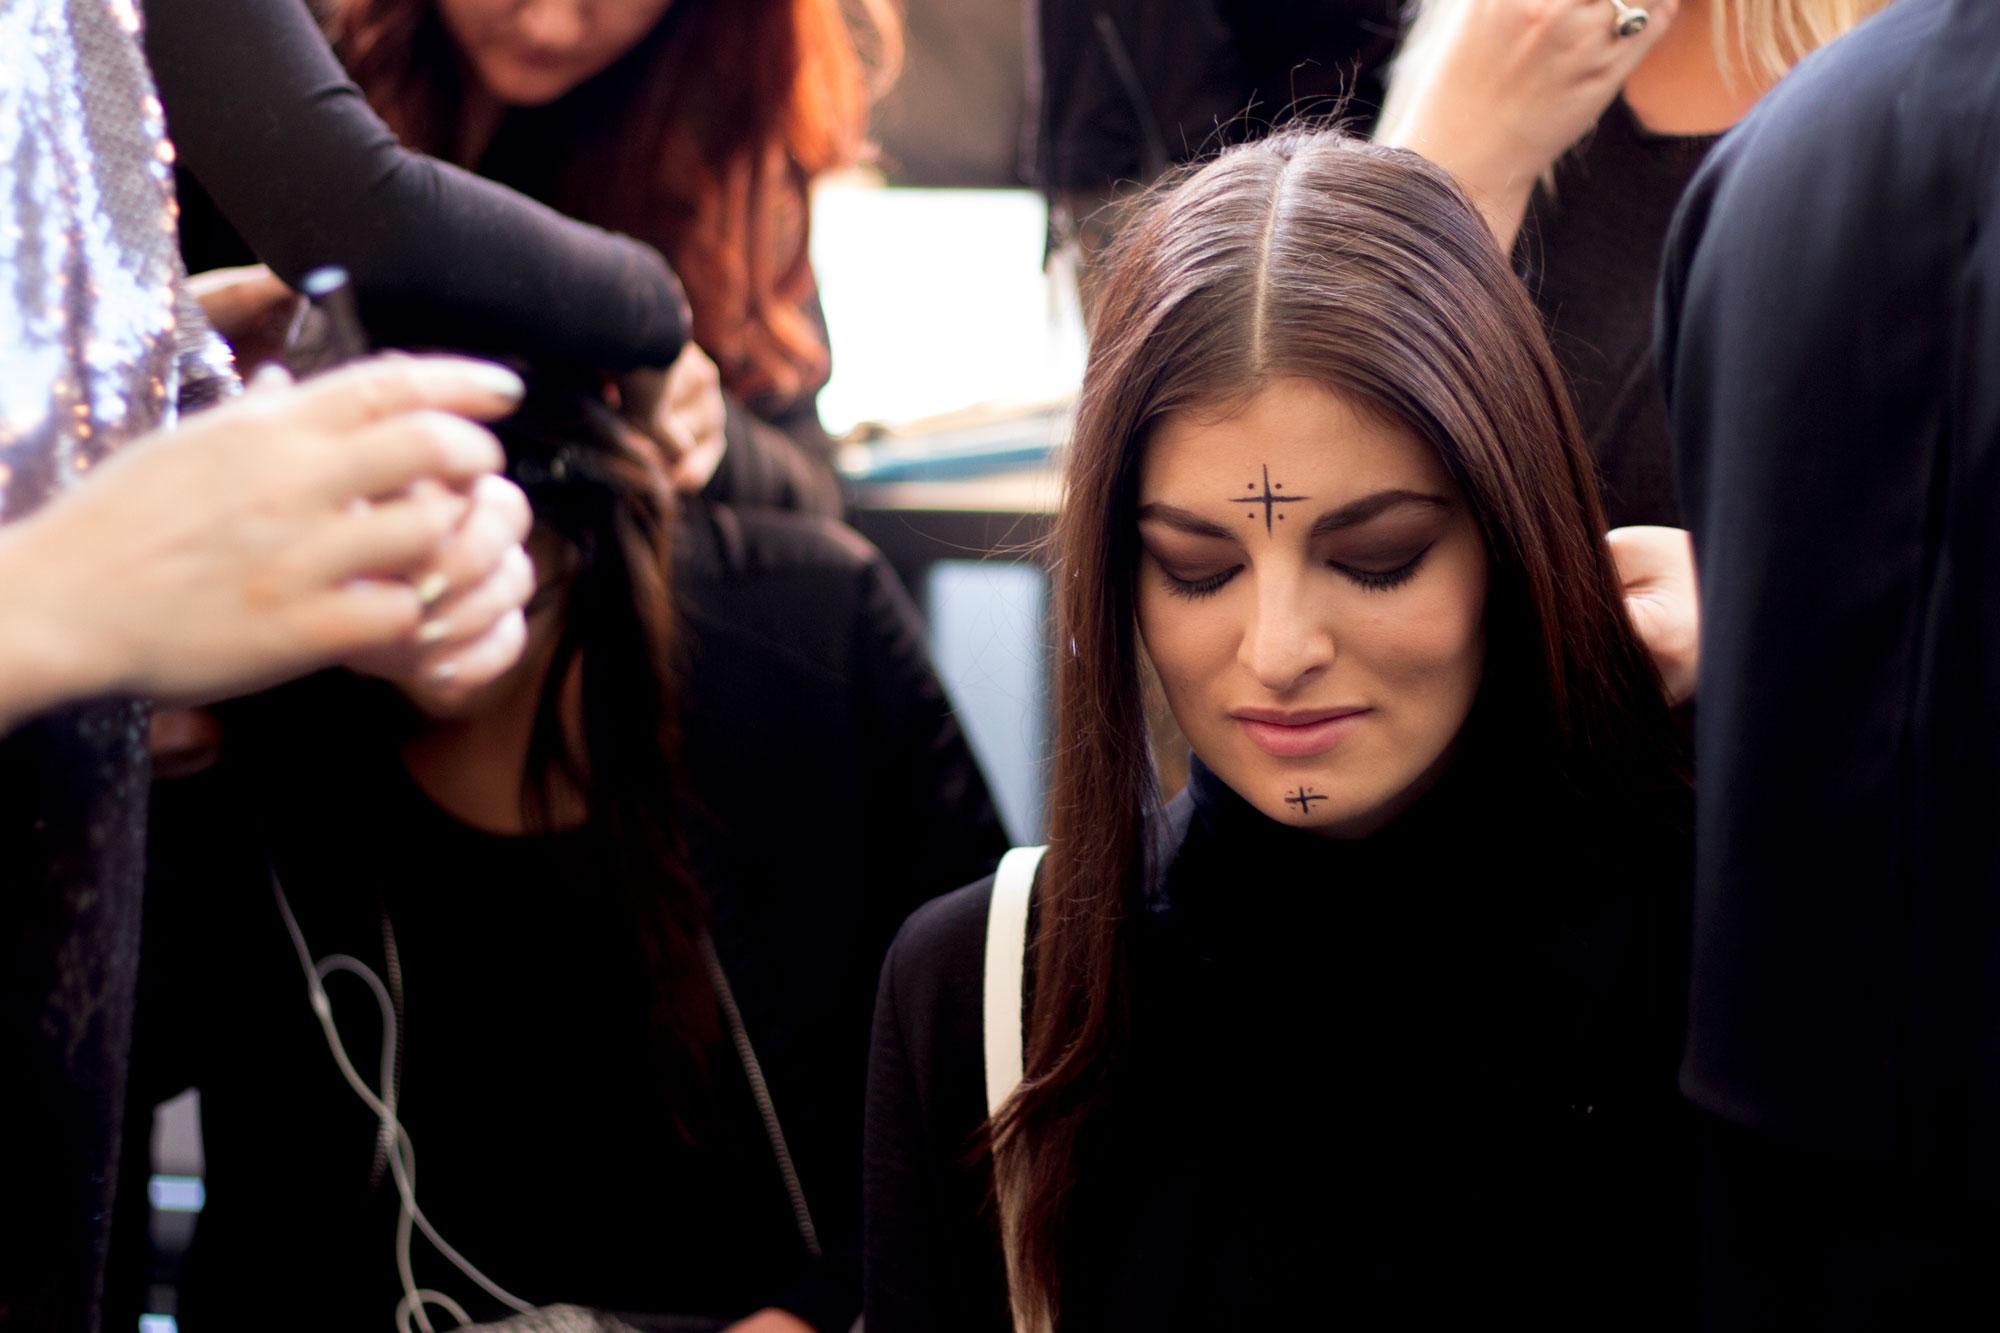 backstage john paul ataker fashion week new  york nyfw honduras moda pasarela jose vargas modelos poses nueva york blog fashion blogger moda street speech